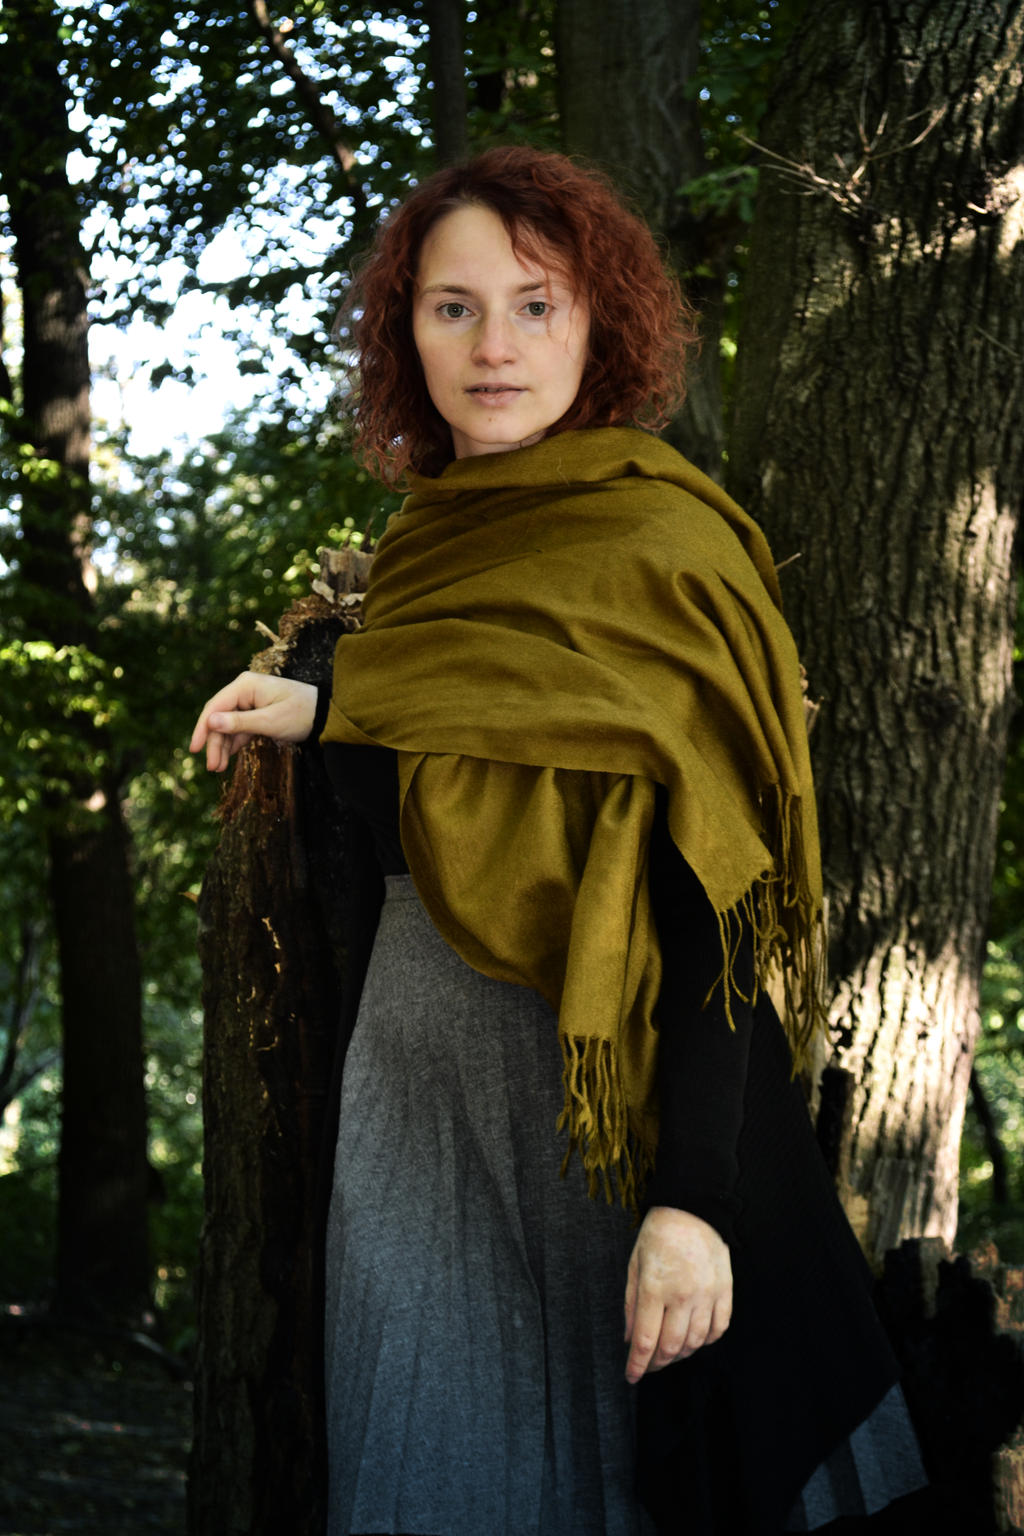 Antalika's Profile Picture